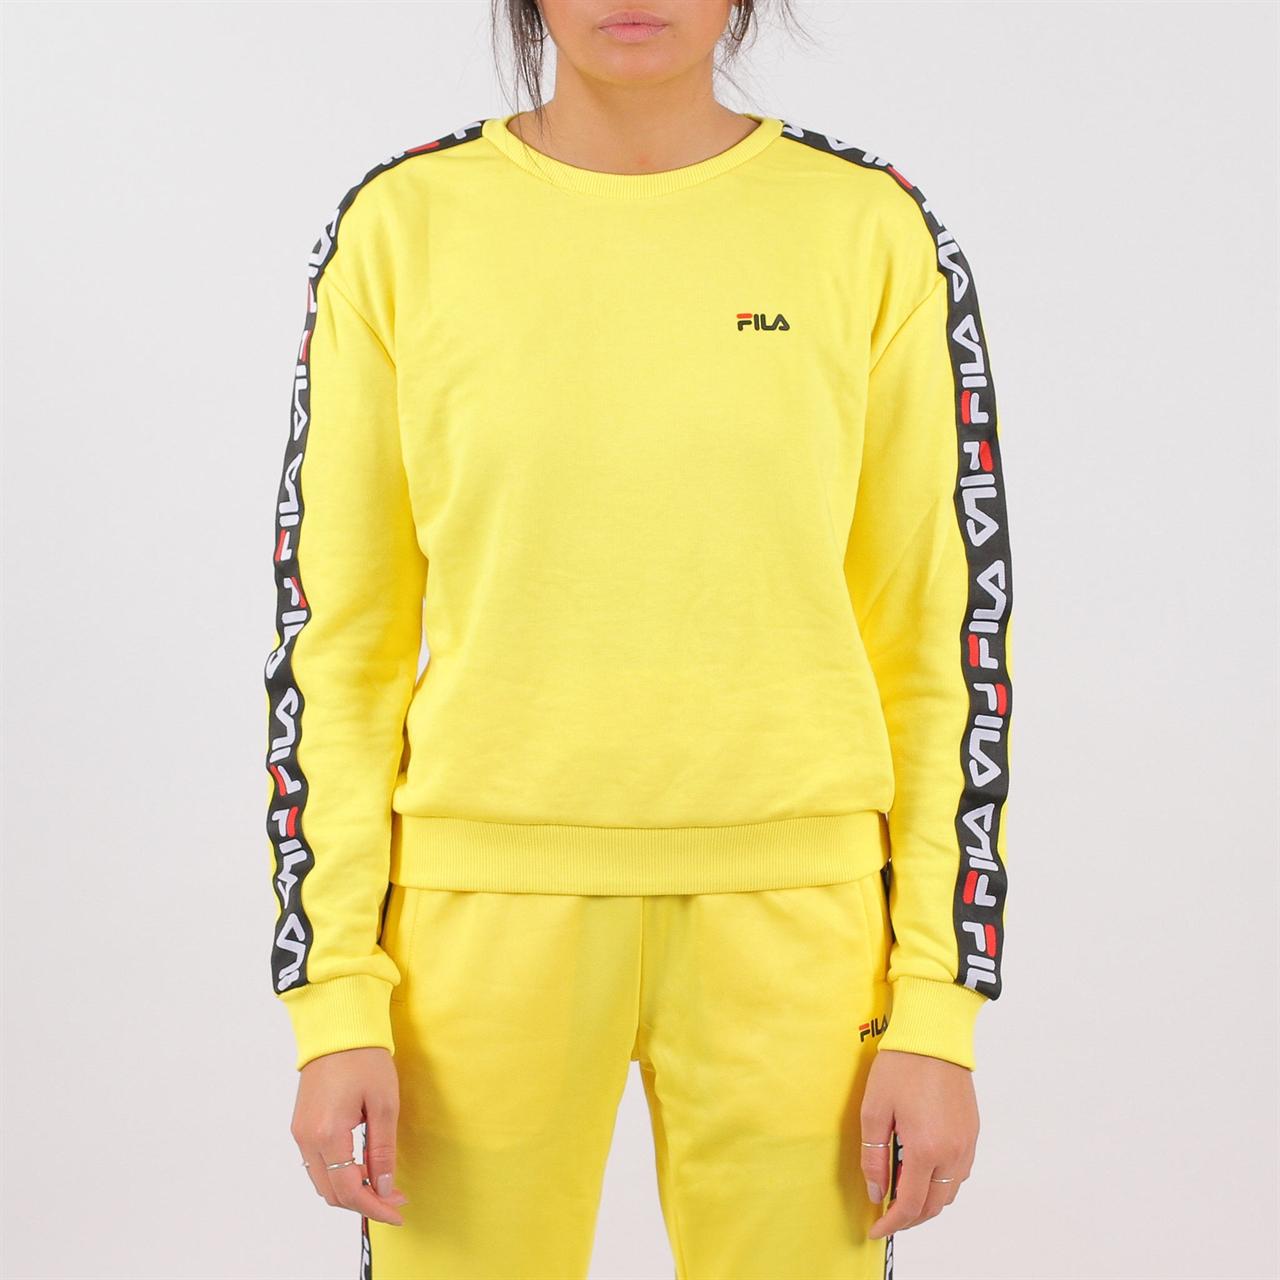 Shelta - Fila Womens Tivka Crew Sweat Yellow (682326-015) 9066566798